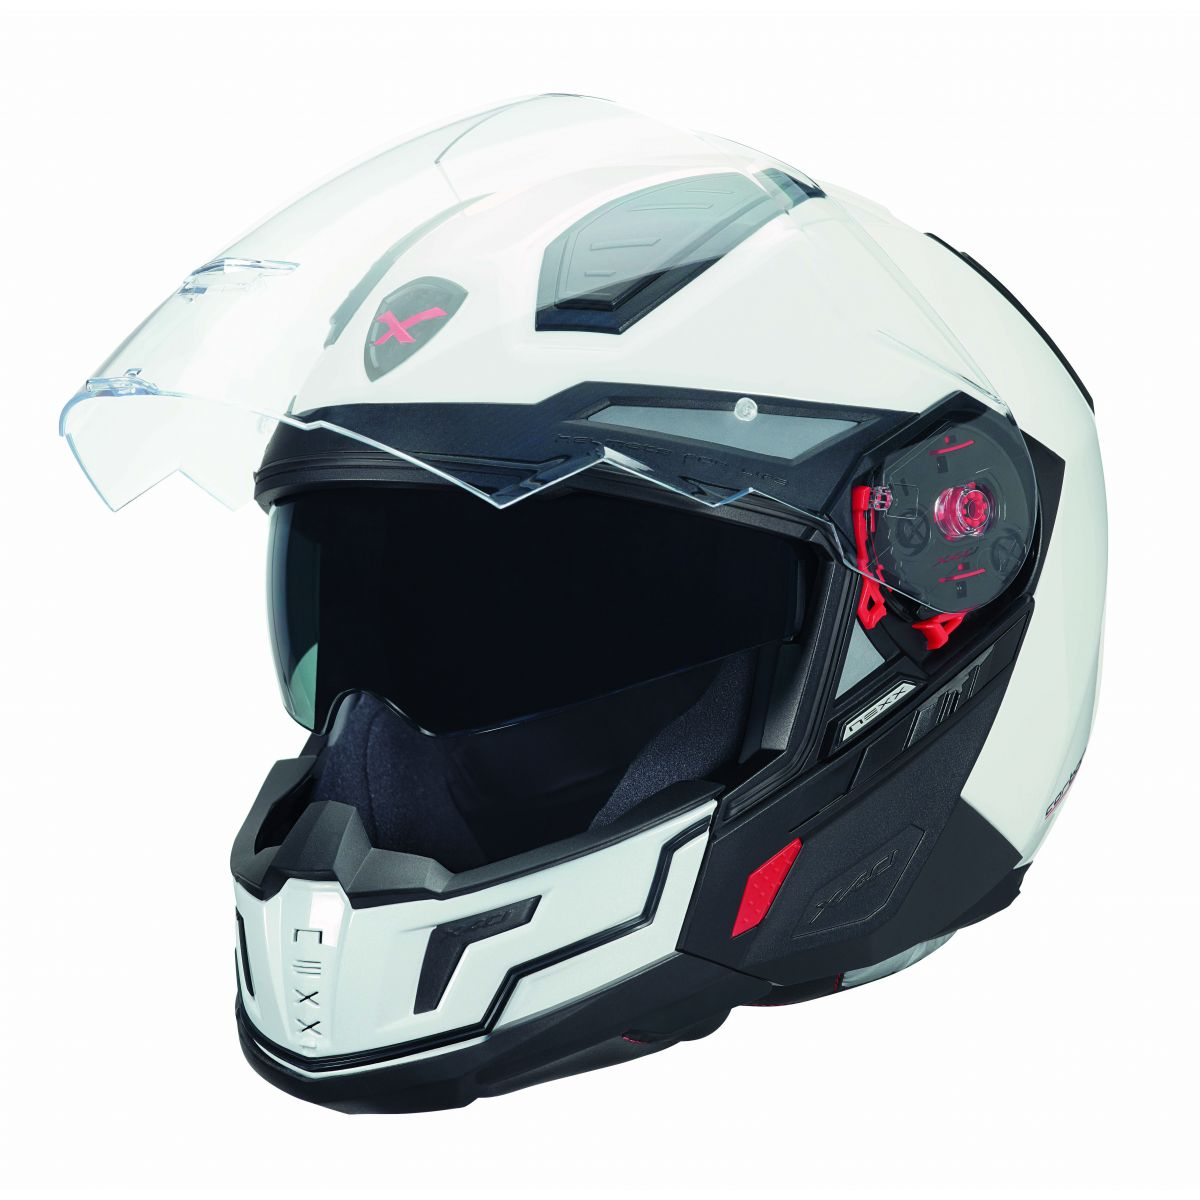 Capacete Nexx X40 Maxijet Plain Branco Promo��o!  - Super Bike - Loja Oficial Alpinestars